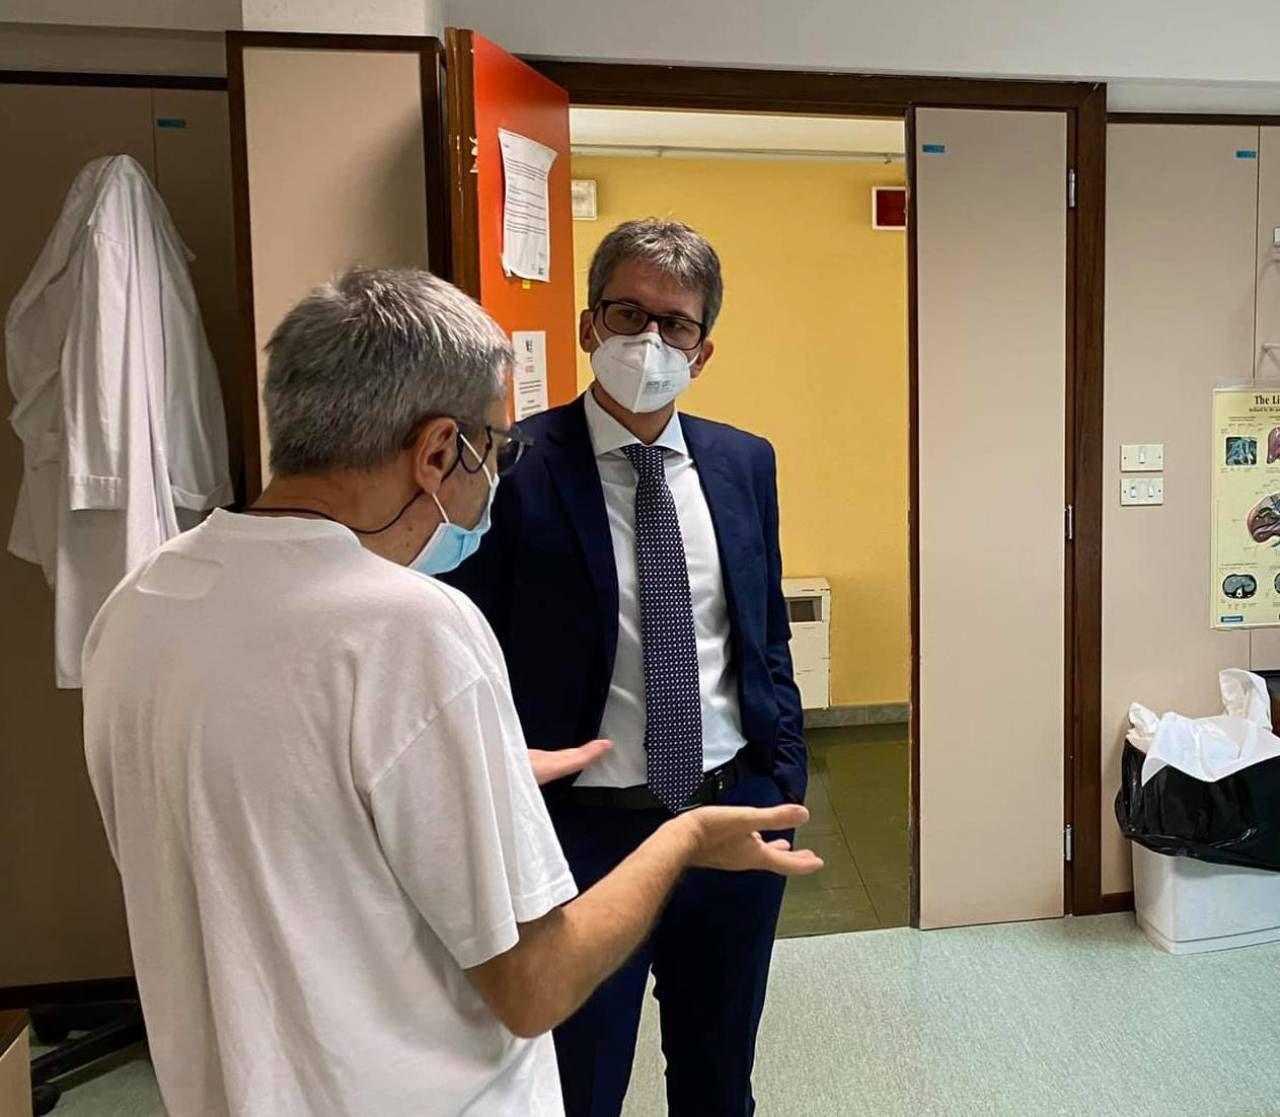 L'assessore in visita all'ospedale